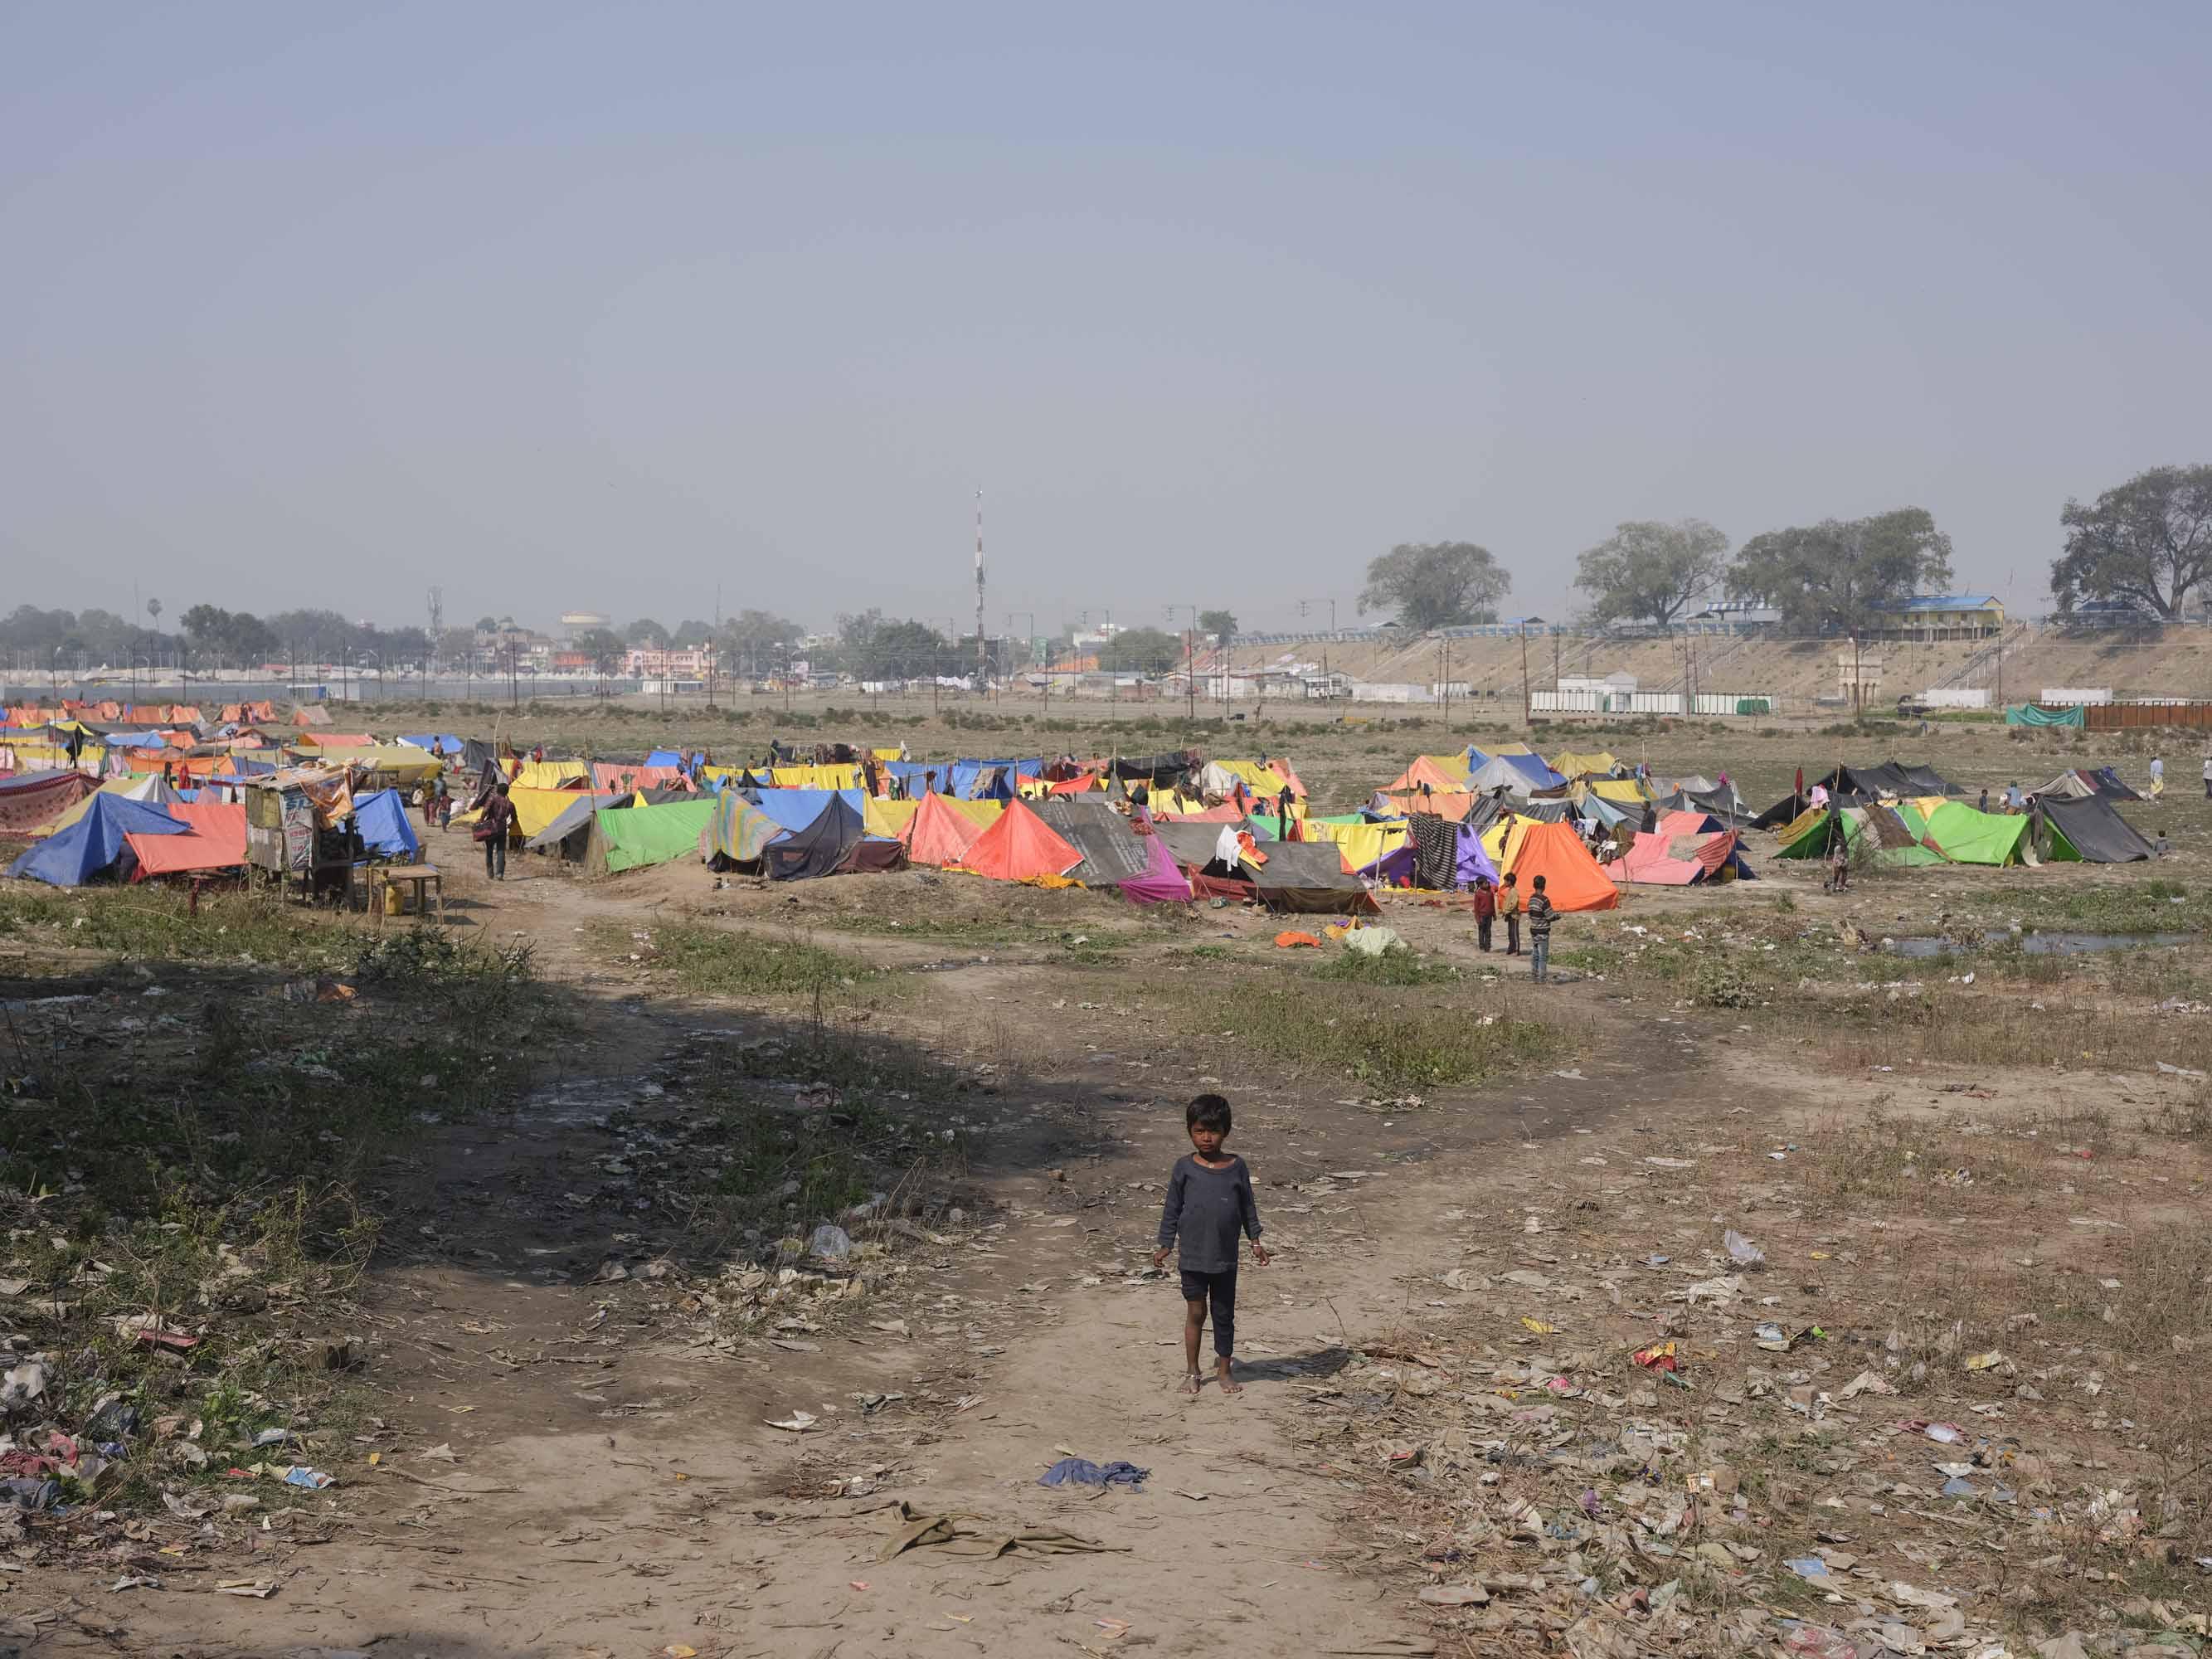 kid camp tent pilgrims Kumbh mela 2019 India Allahabad Prayagraj Ardh hindu religious Festival event rivers photographer jose jeuland photography